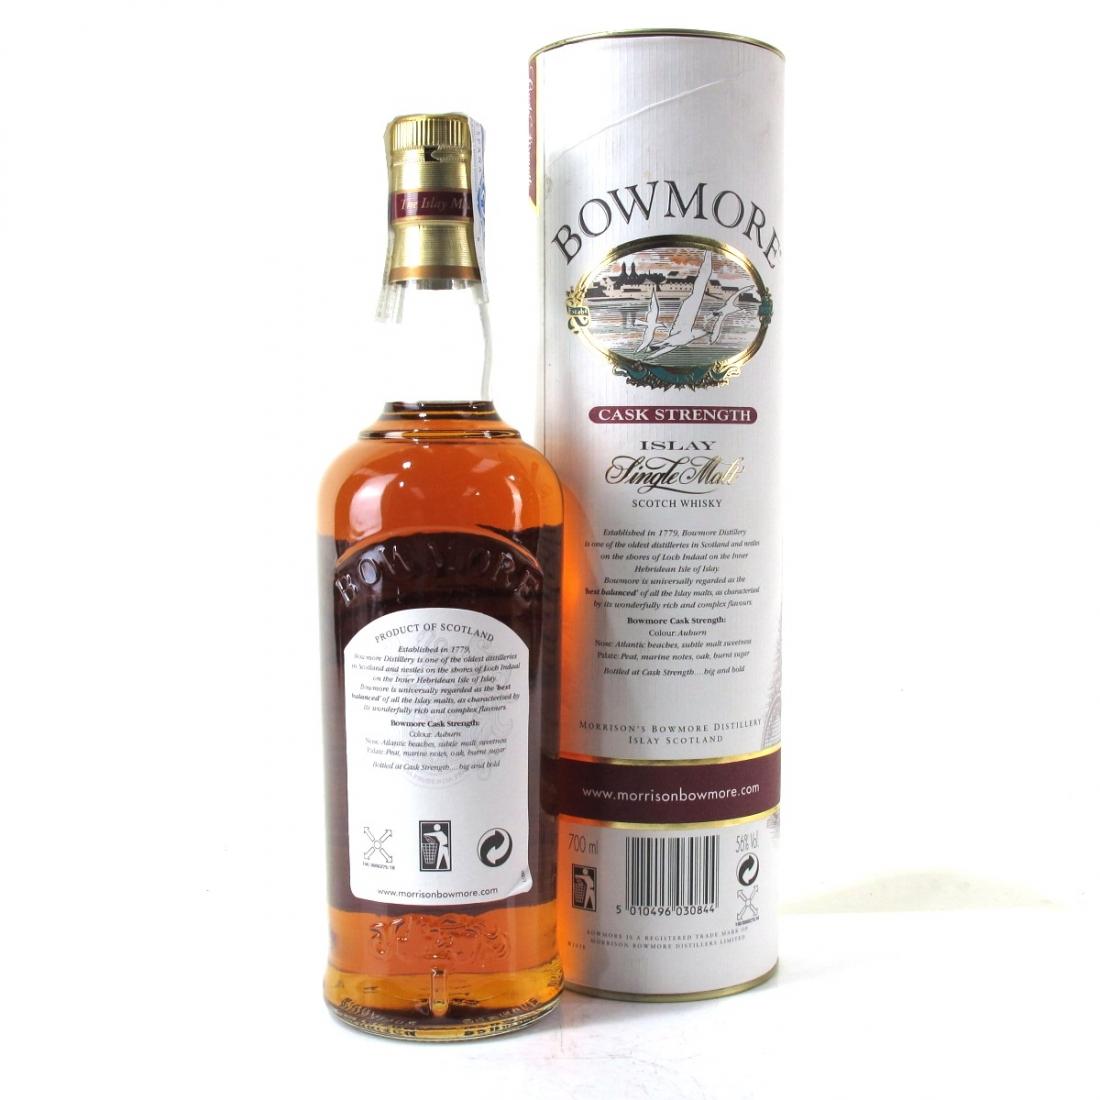 Bowmore Cask Strength